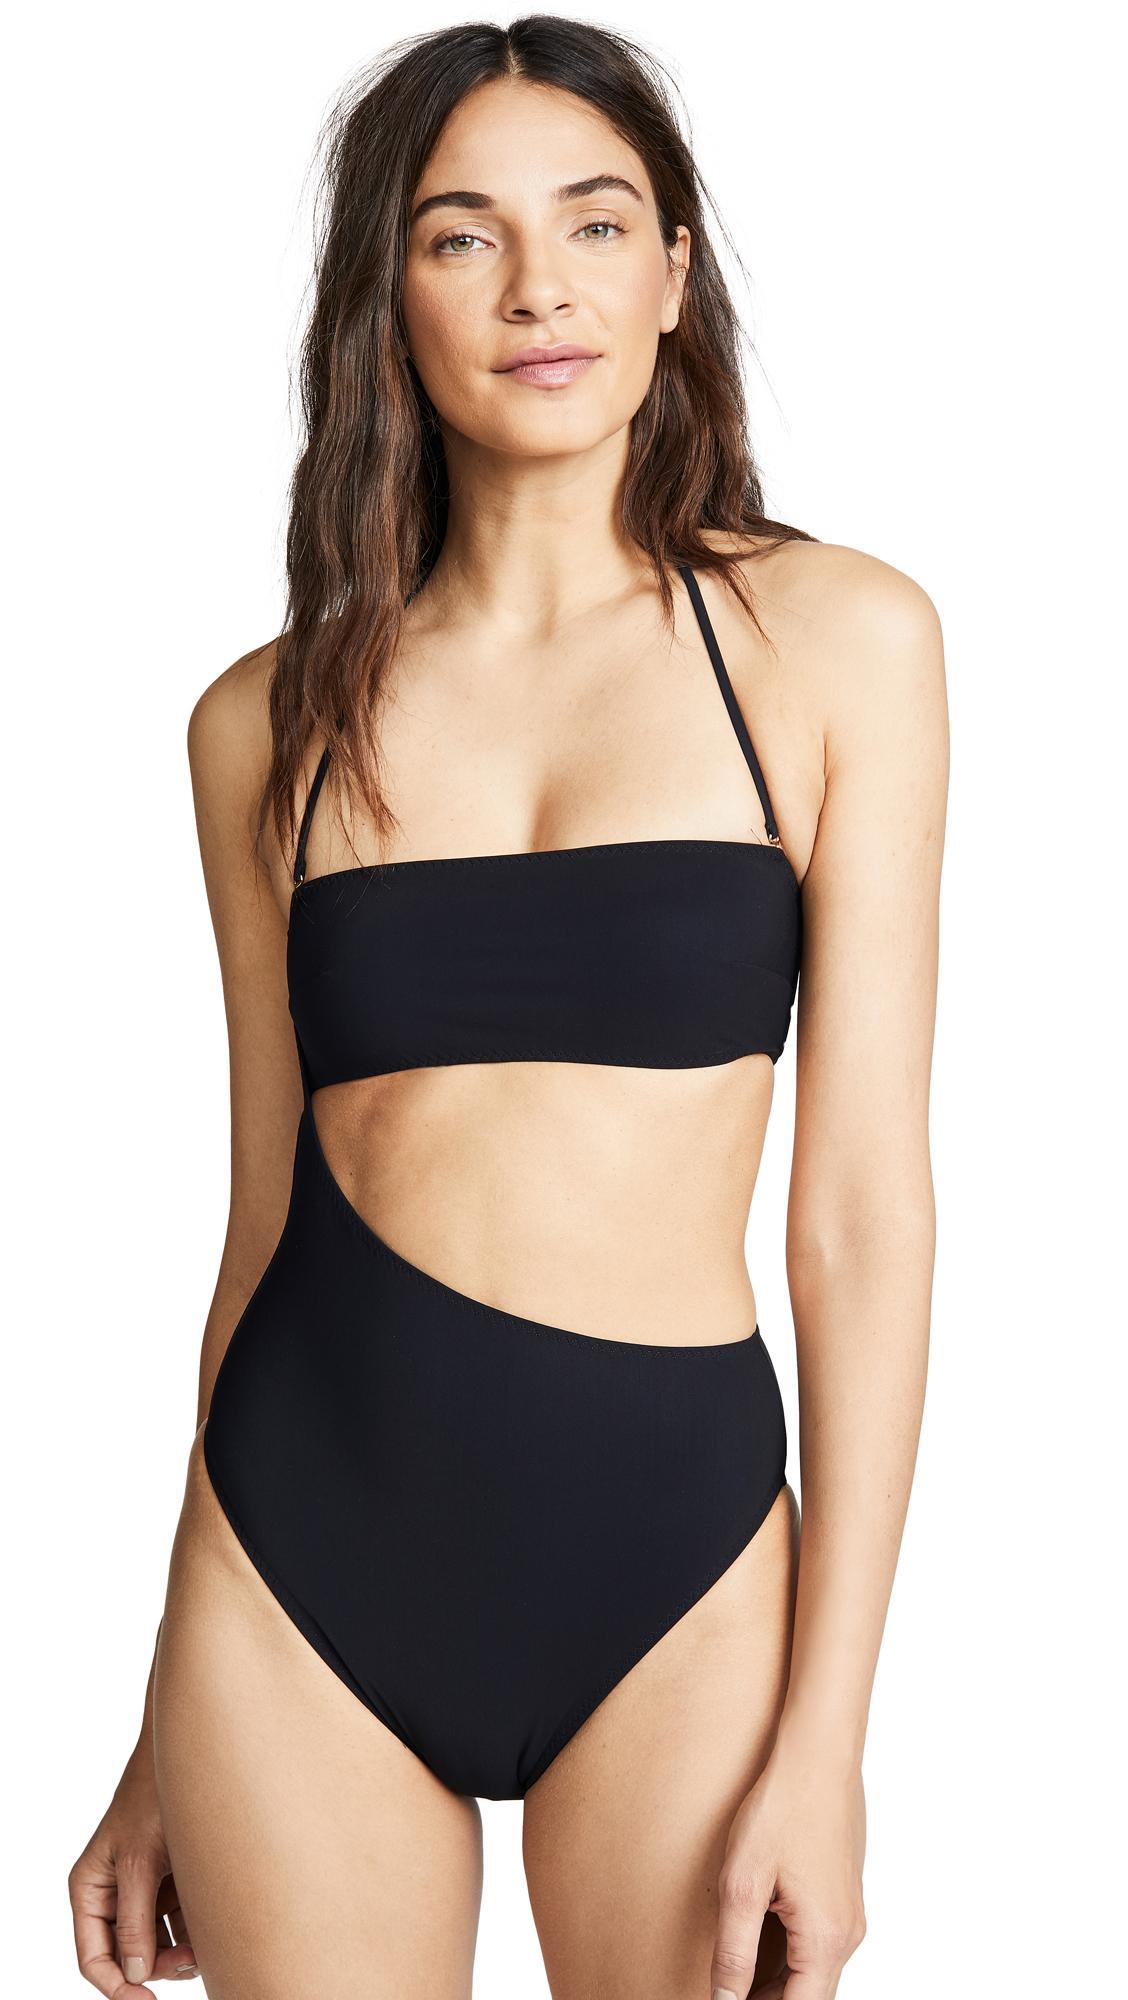 Stella Mccartney One Piece Strapless Swimsuit In Black